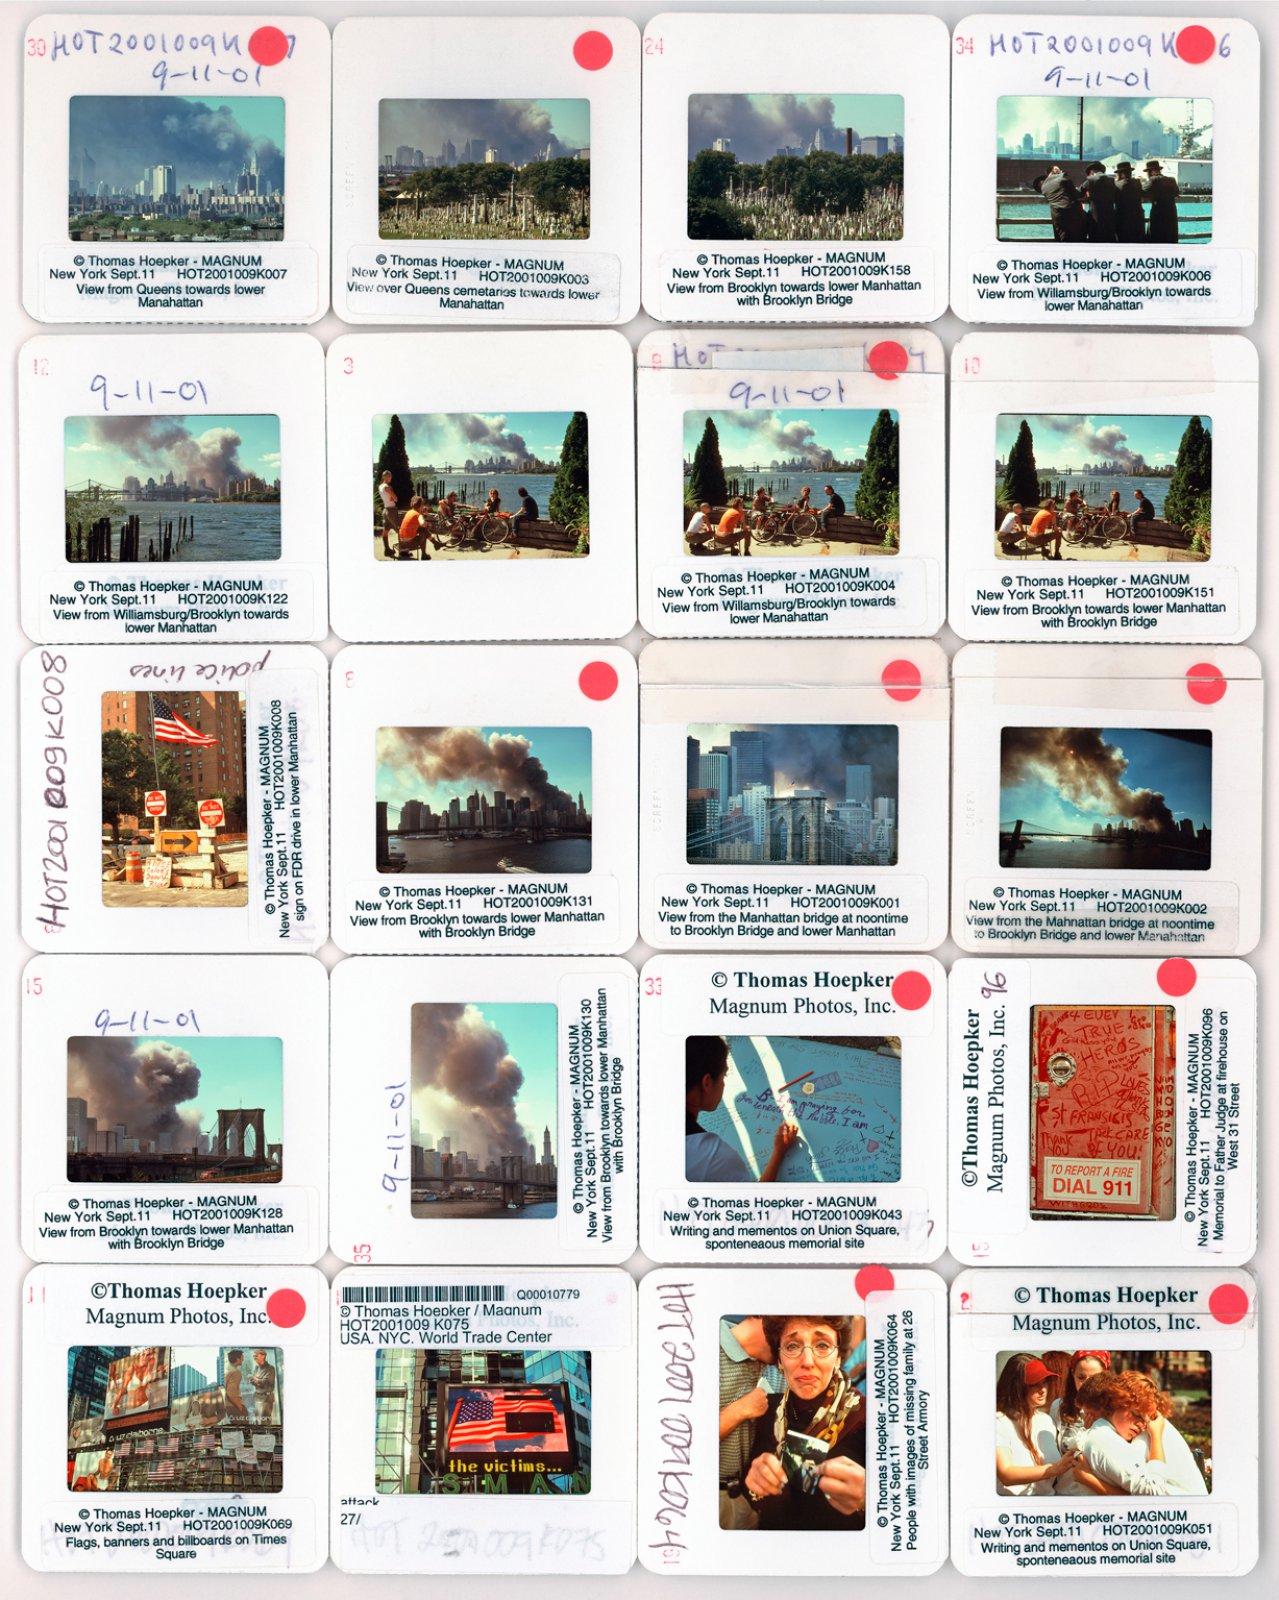 9/11. New York, USA. 2001. Contact Sheet © Thomas Hoepker / Magnum Photos